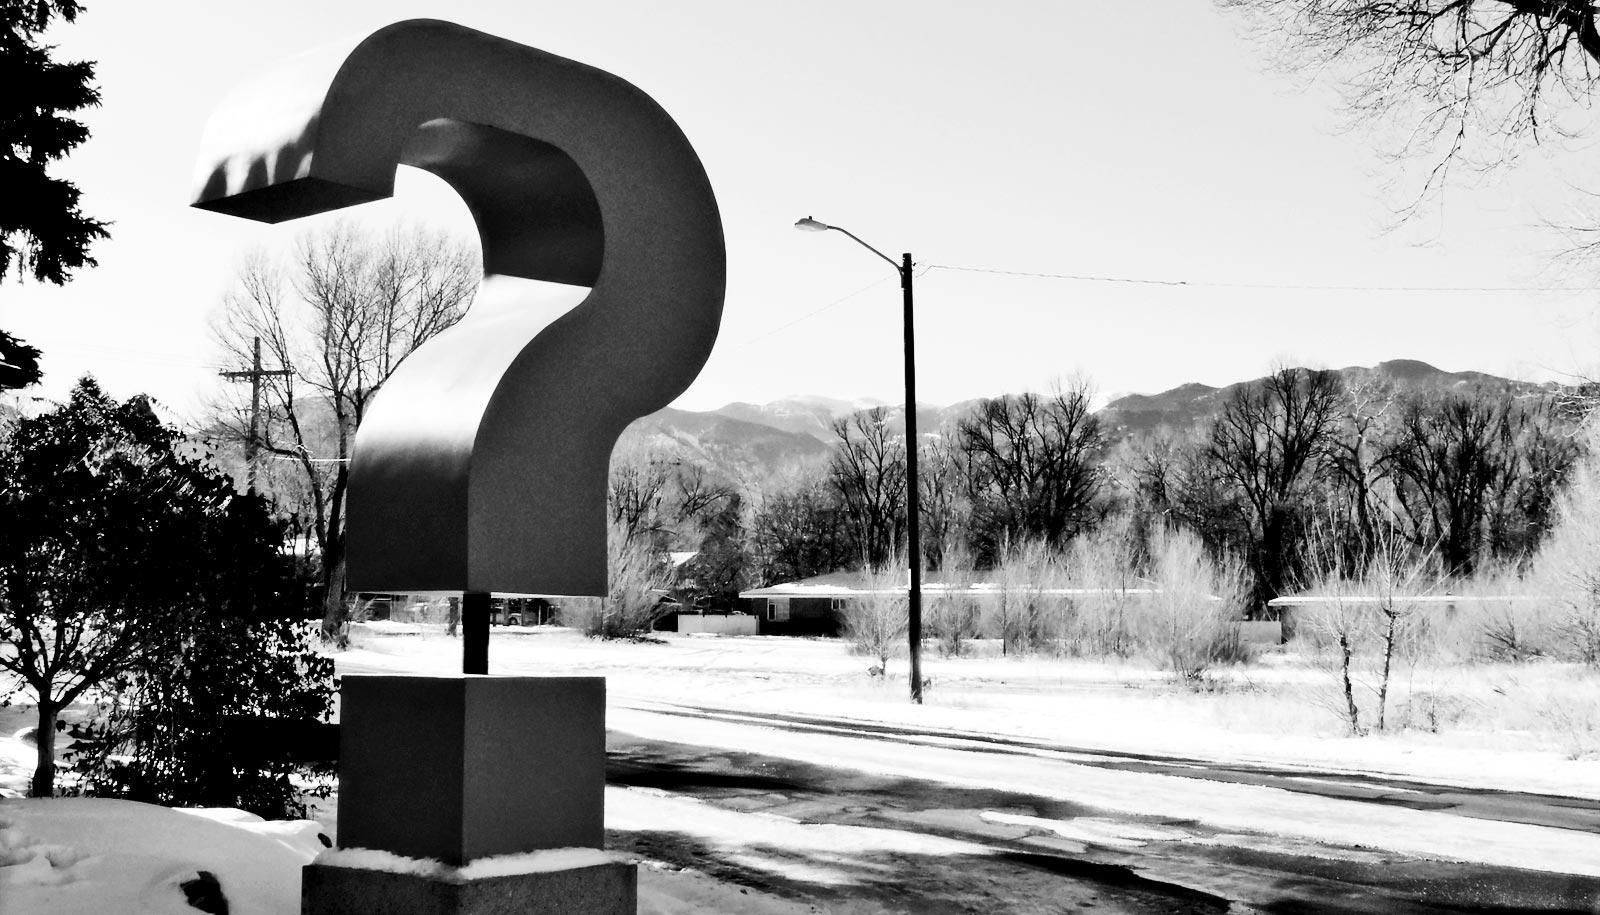 question mark on the side of the road (autonomous robots concept)